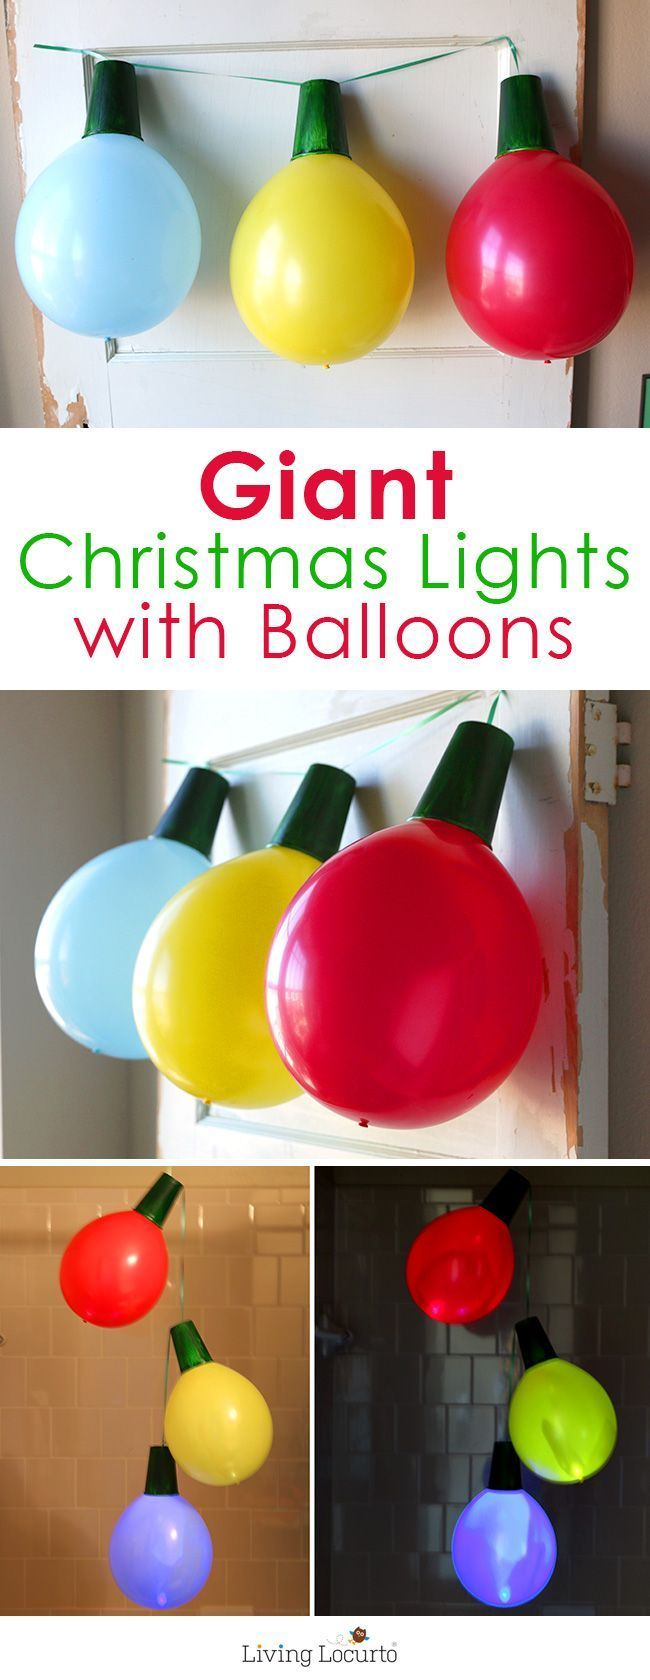 Giant Balloon Christmas Lights and Ornaments